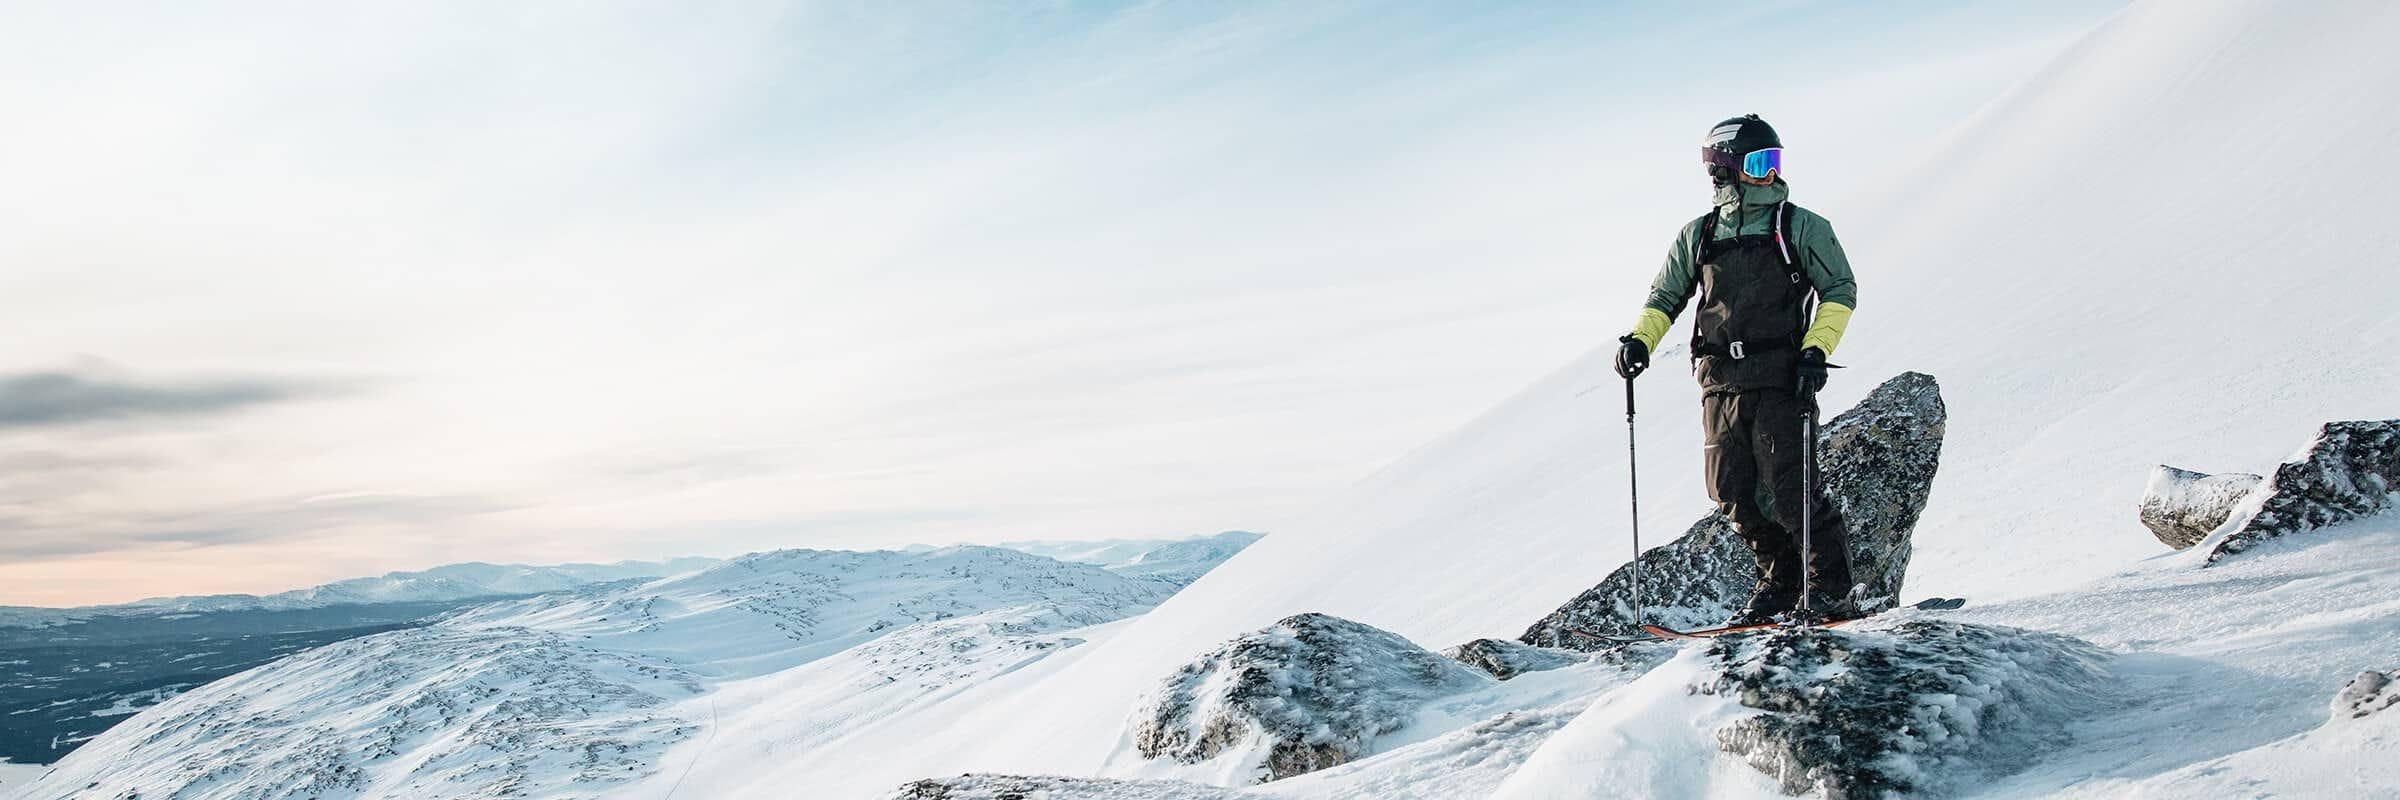 Best Ski Jackets for 2021